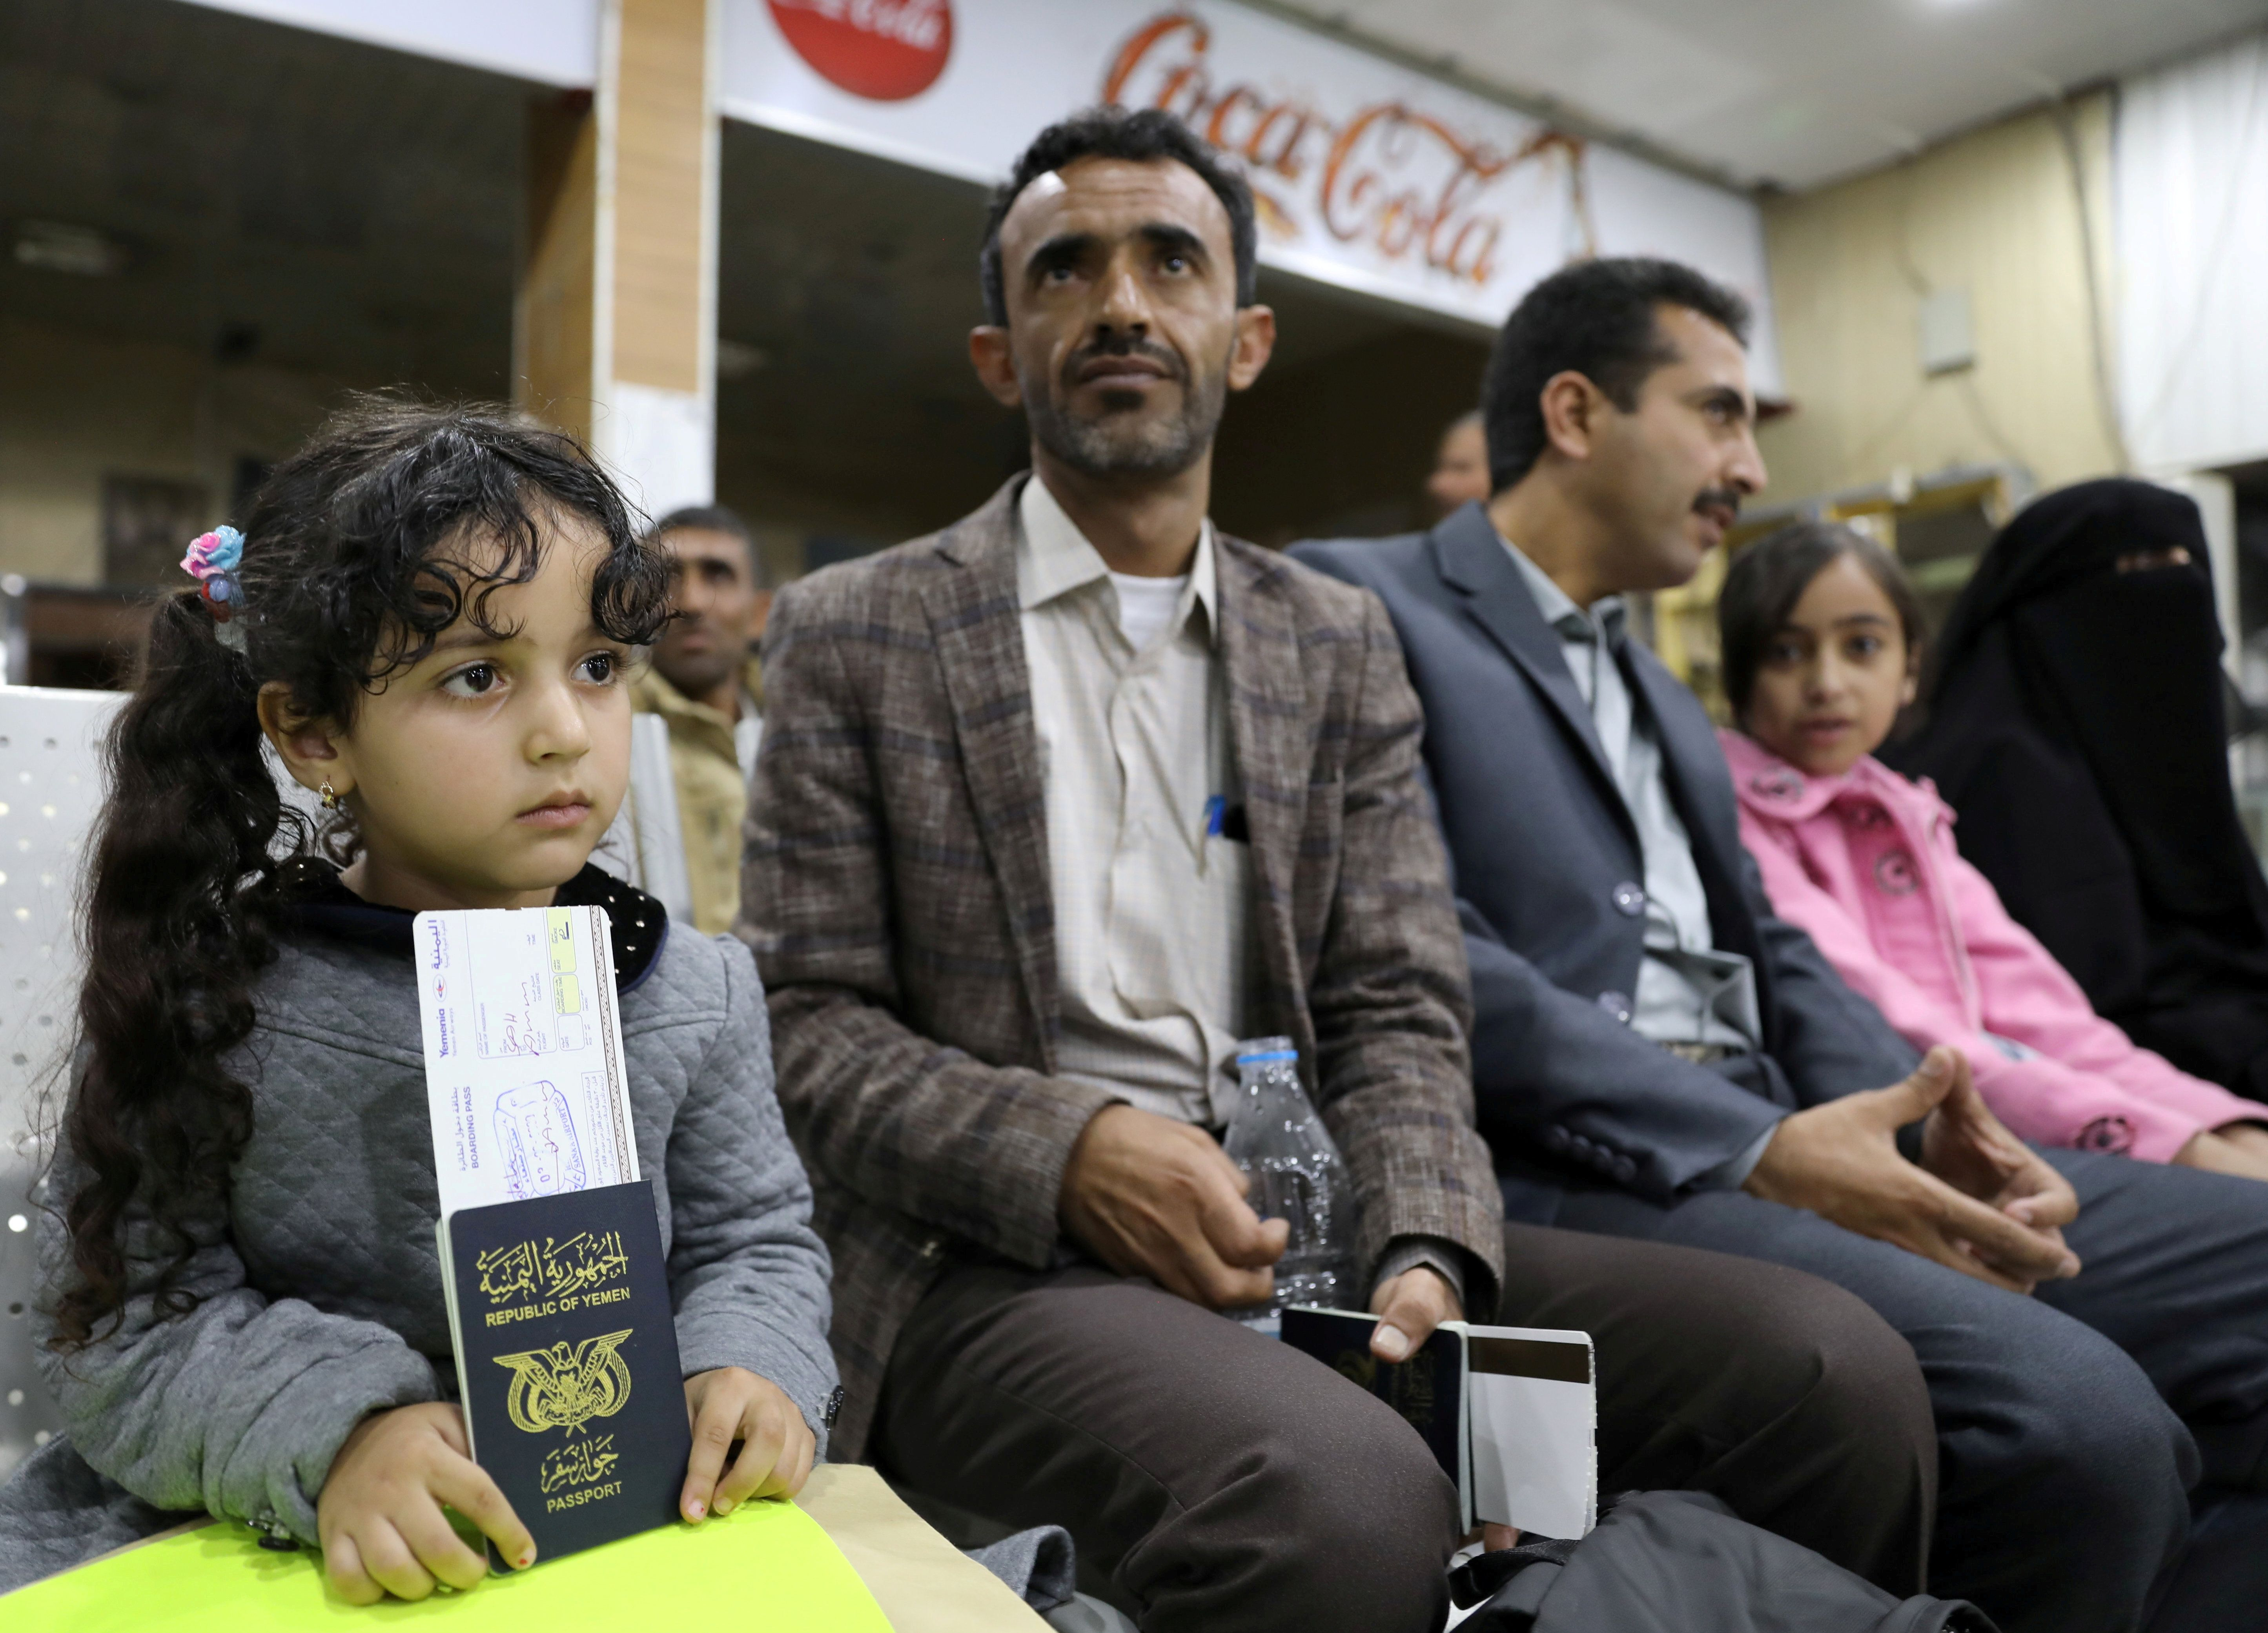 What We're Watching: Yemen breakthrough, Turkey vs Russia, arresting Zuma?